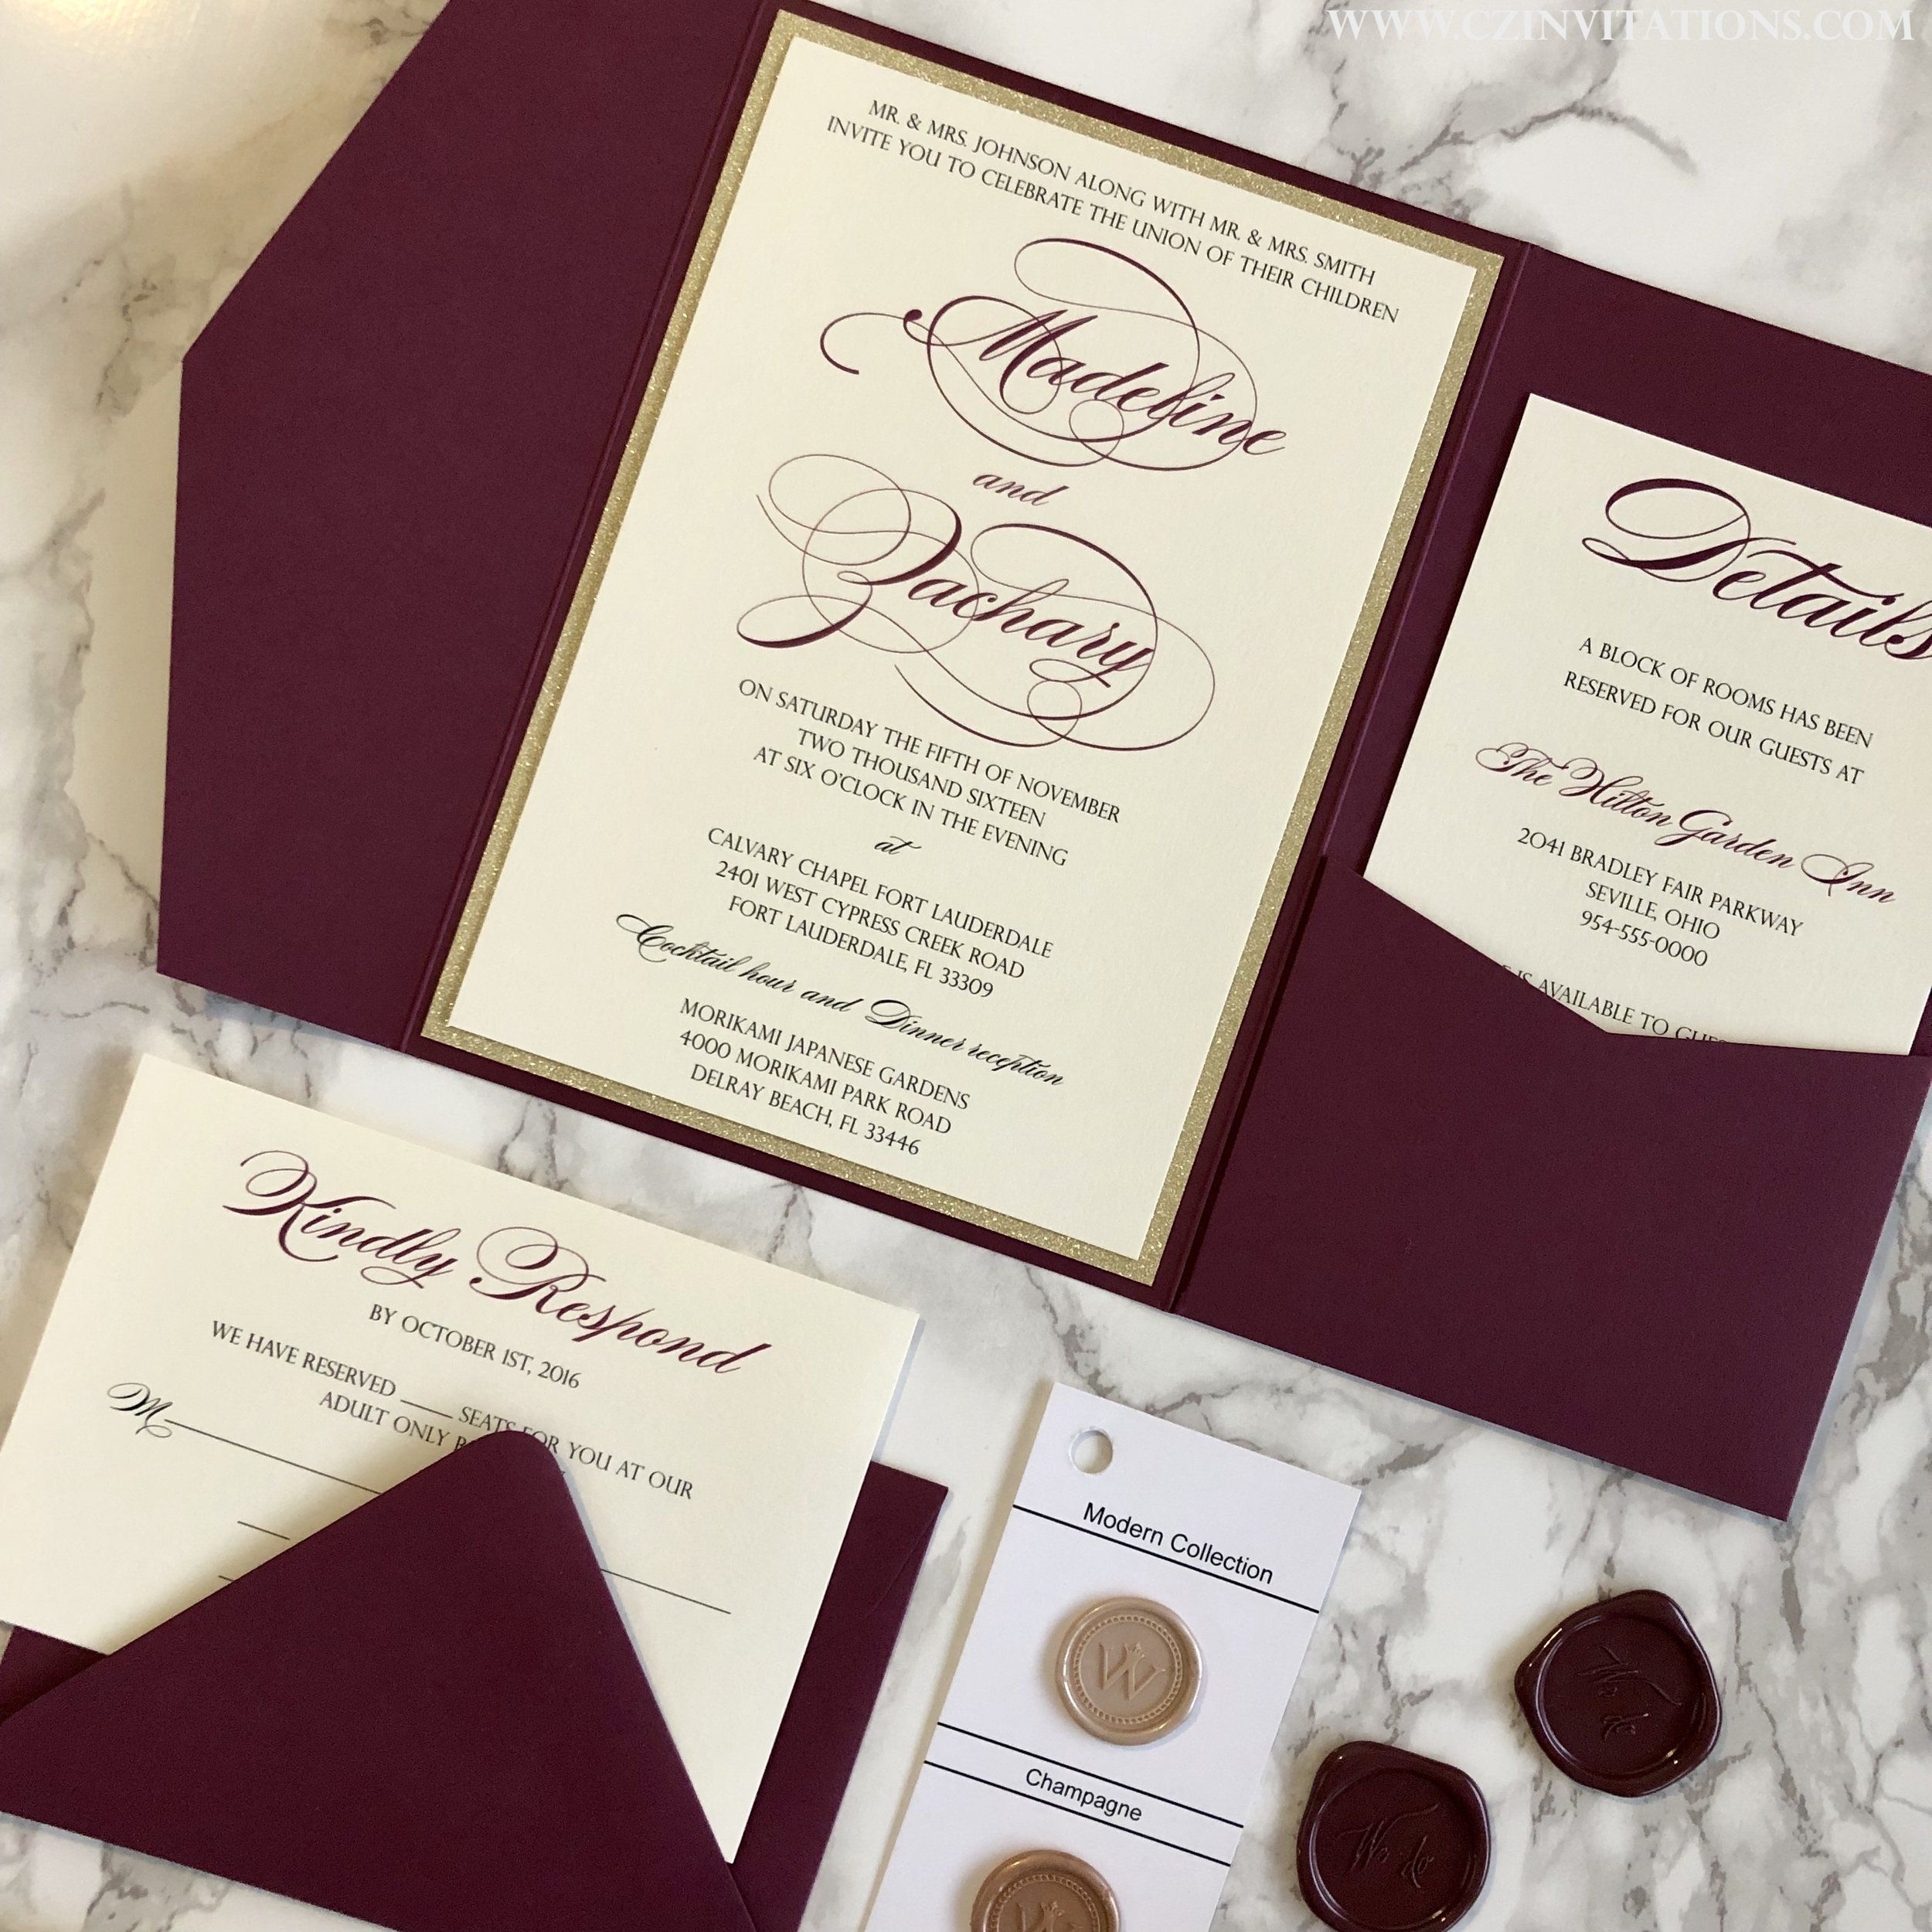 Burgundy And Gold Glitter Pocket Wedding Invitation Cz Invitations Burgundy Wedding Invitations Pocket Wedding Invitations Wedding Invitations Diy